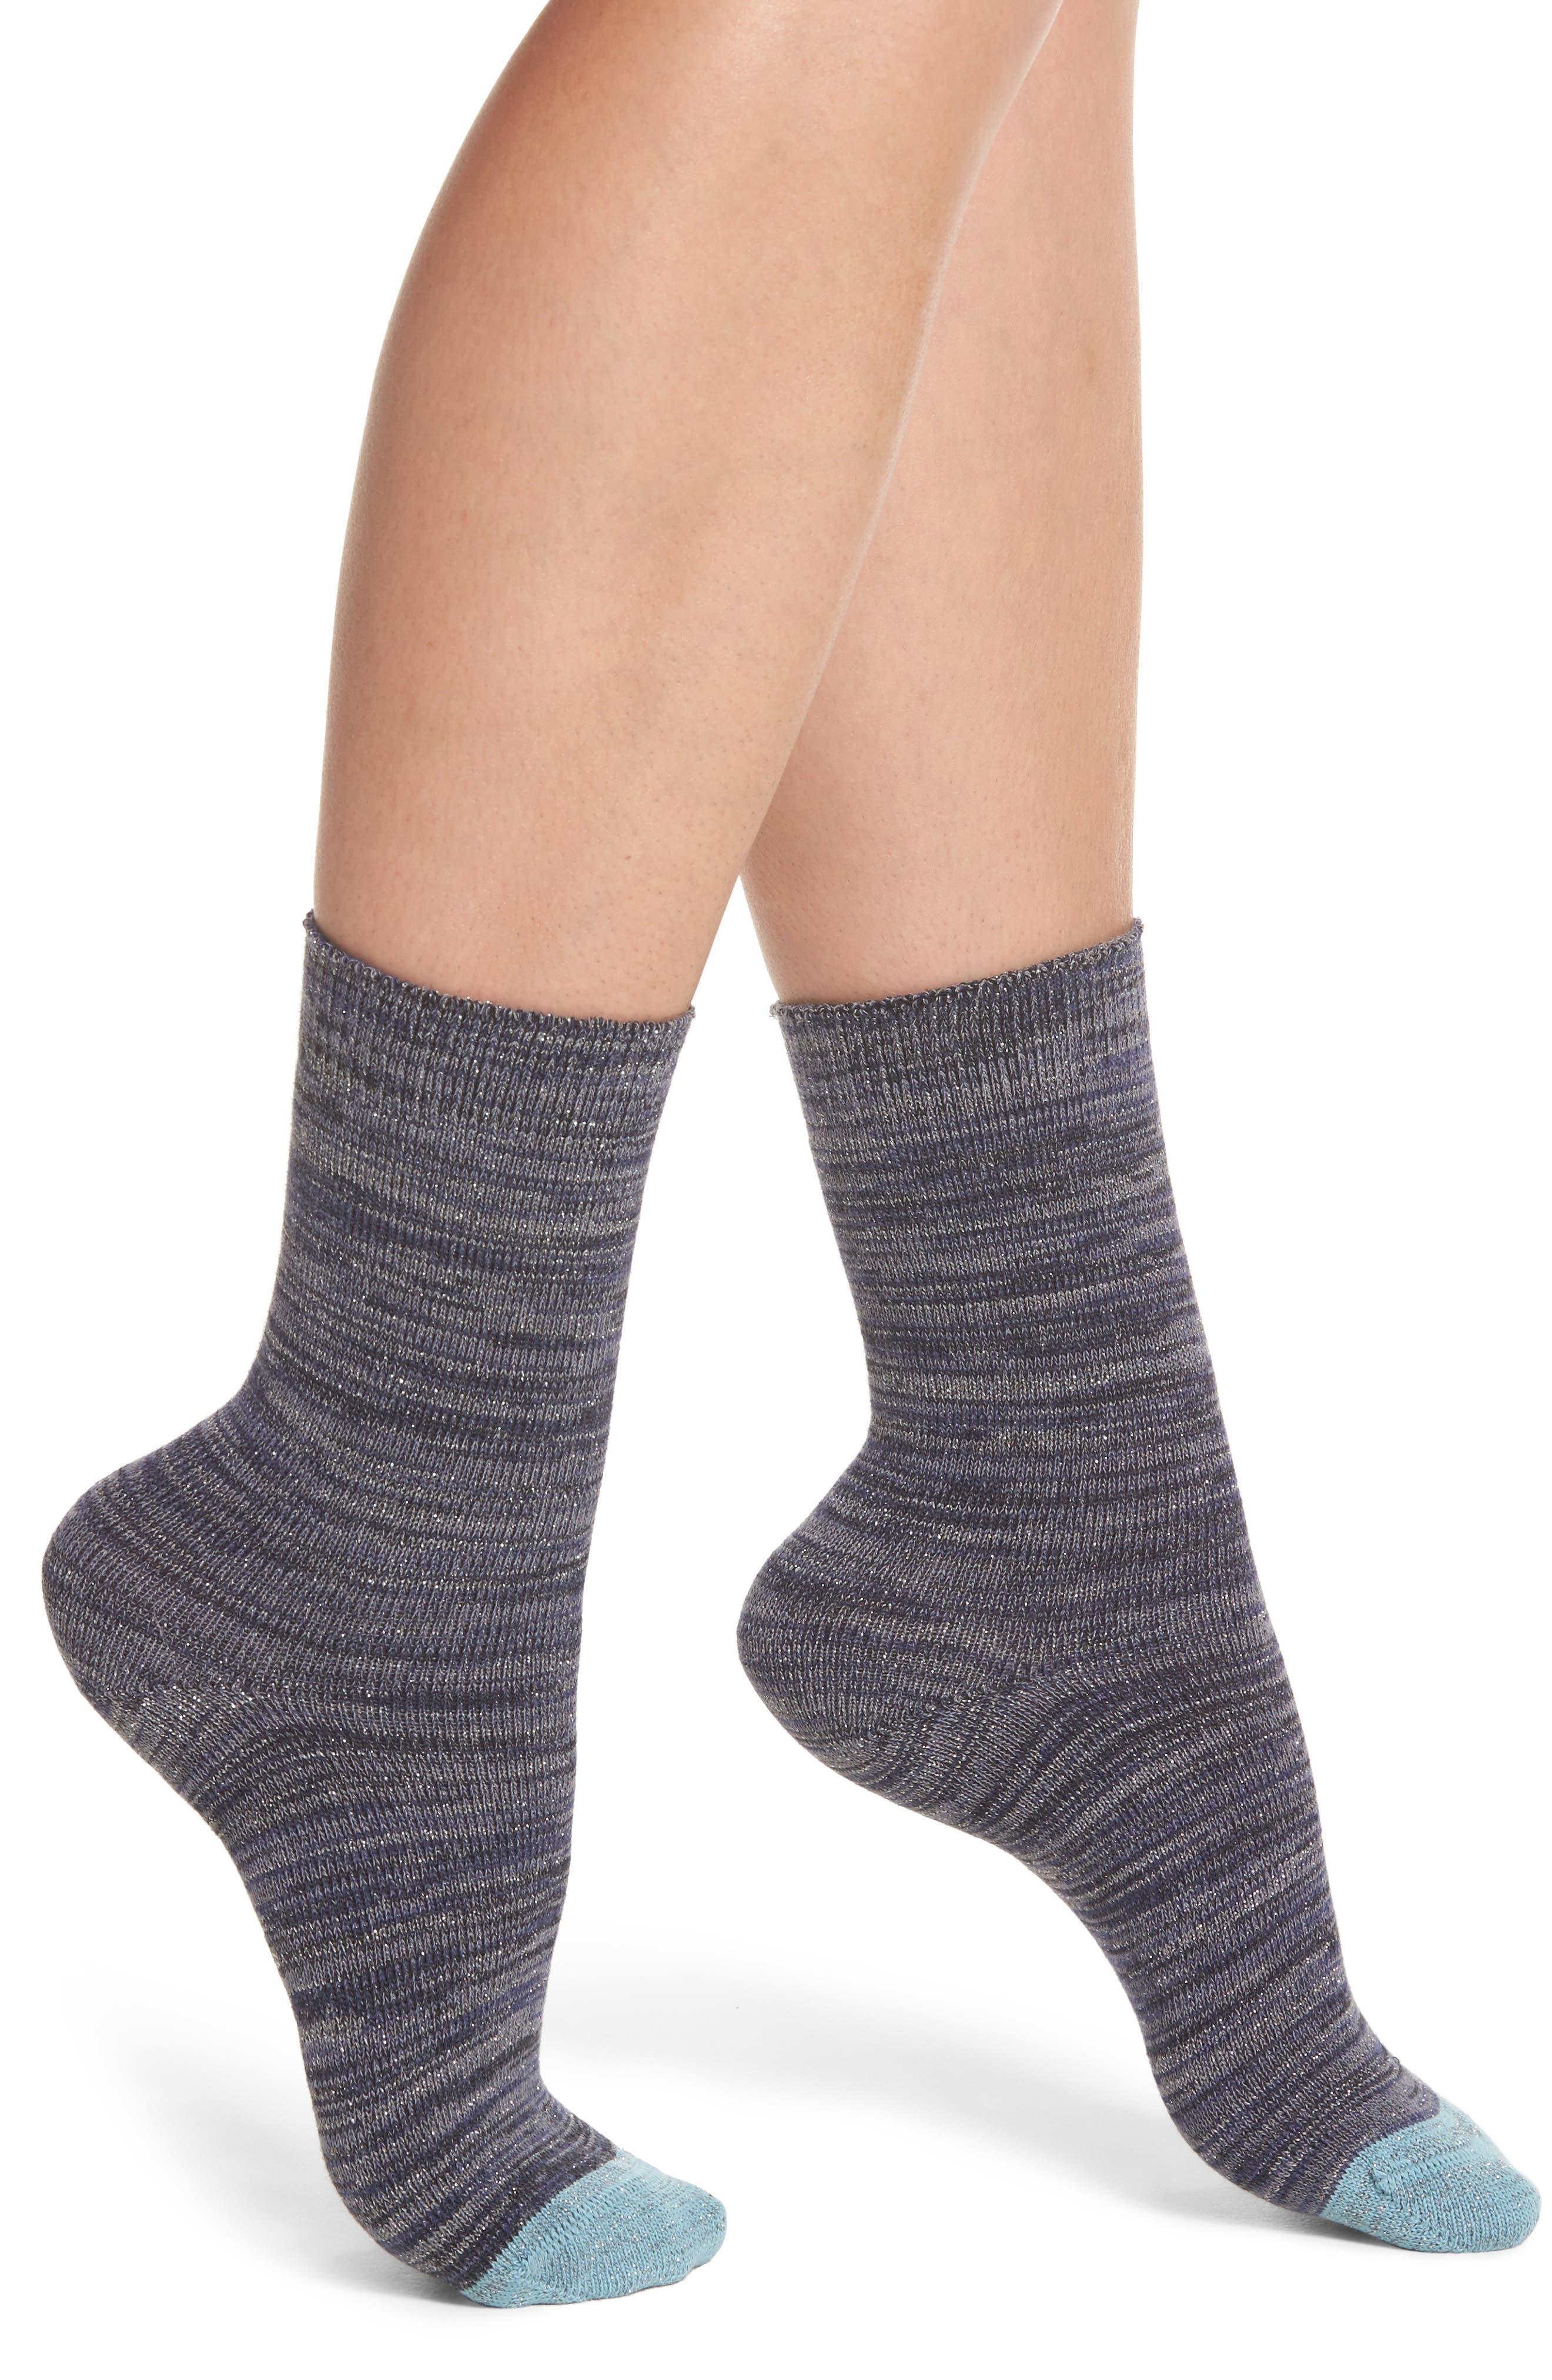 Emily Twinkletoes Crew Socks,                             Main thumbnail 1, color,                             Navy